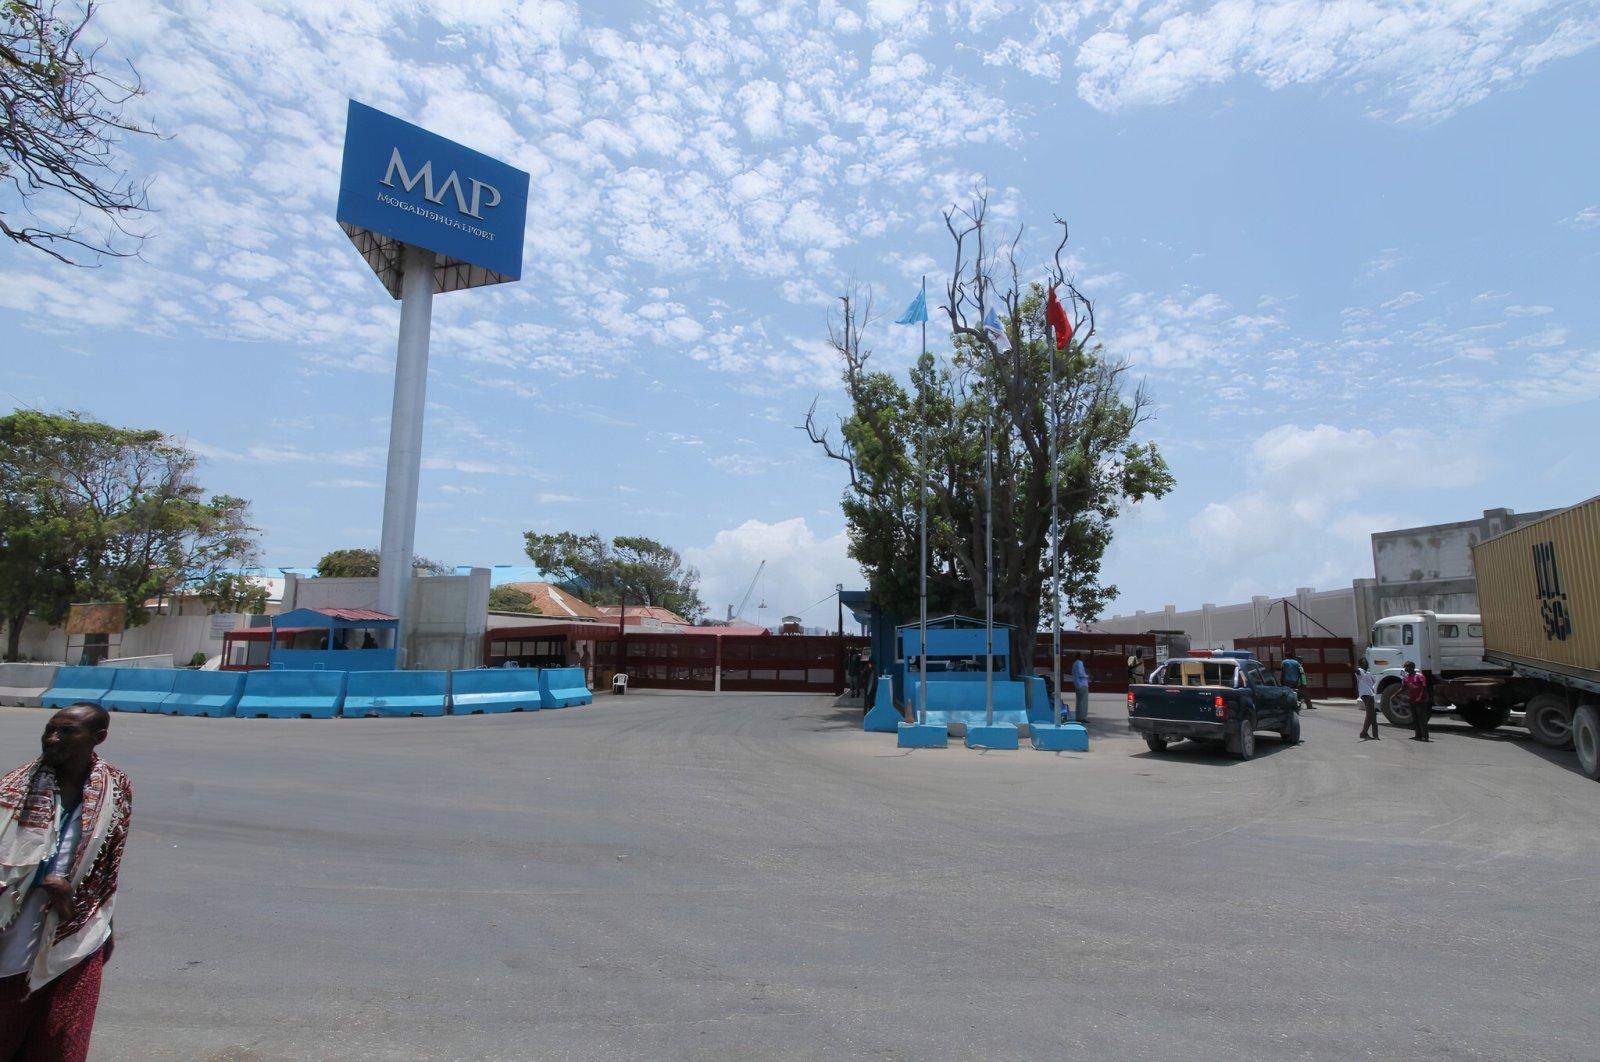 A view of an entrance to Mogadishu Port in the Somalian capital Mogadishu. (Courtesy of portofmogadishu.com)